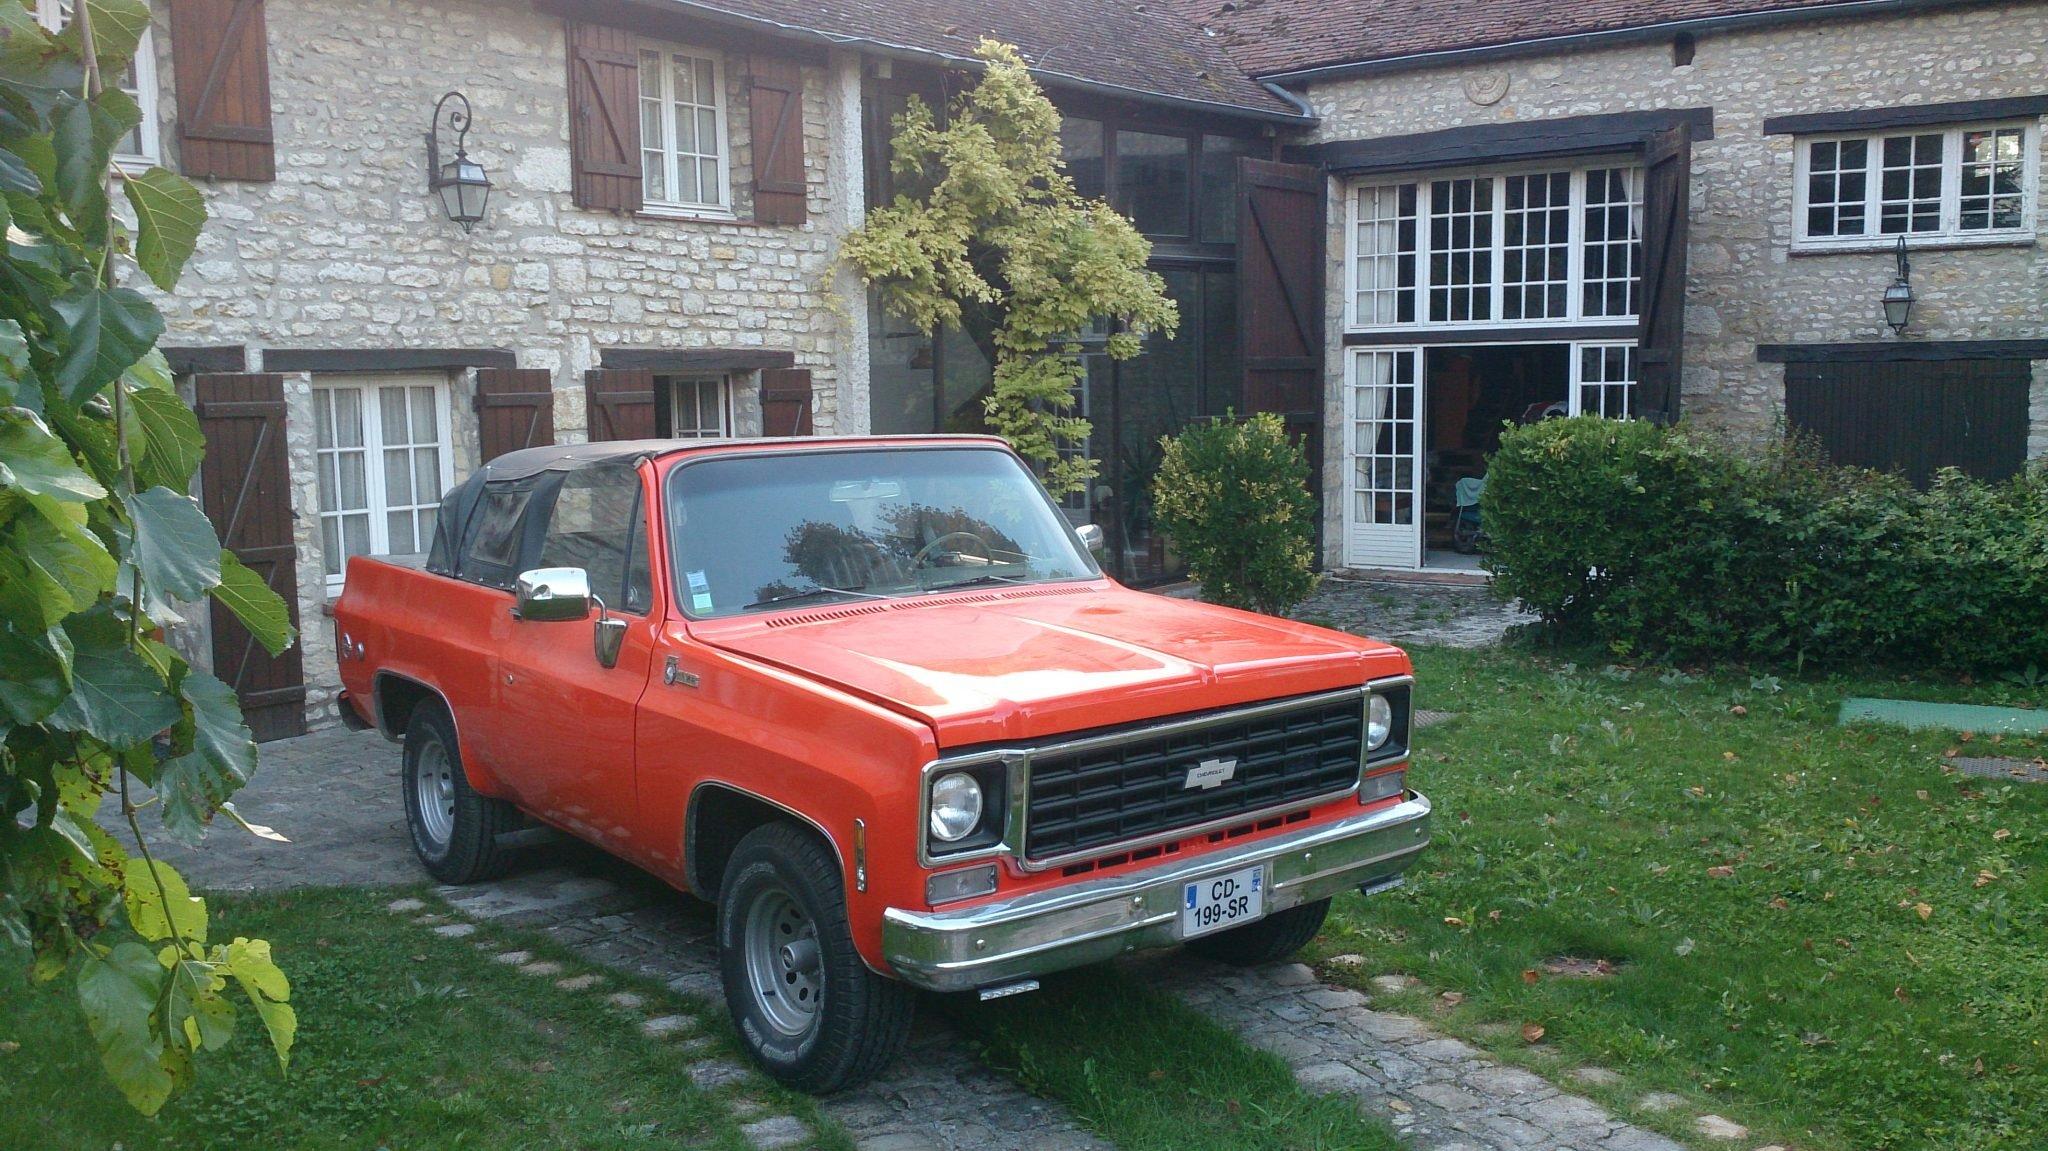 1975 Chevrolet Blazer K5 Cheyenne CABRIOLET UNIQUE For Sale (picture 4 of 6)